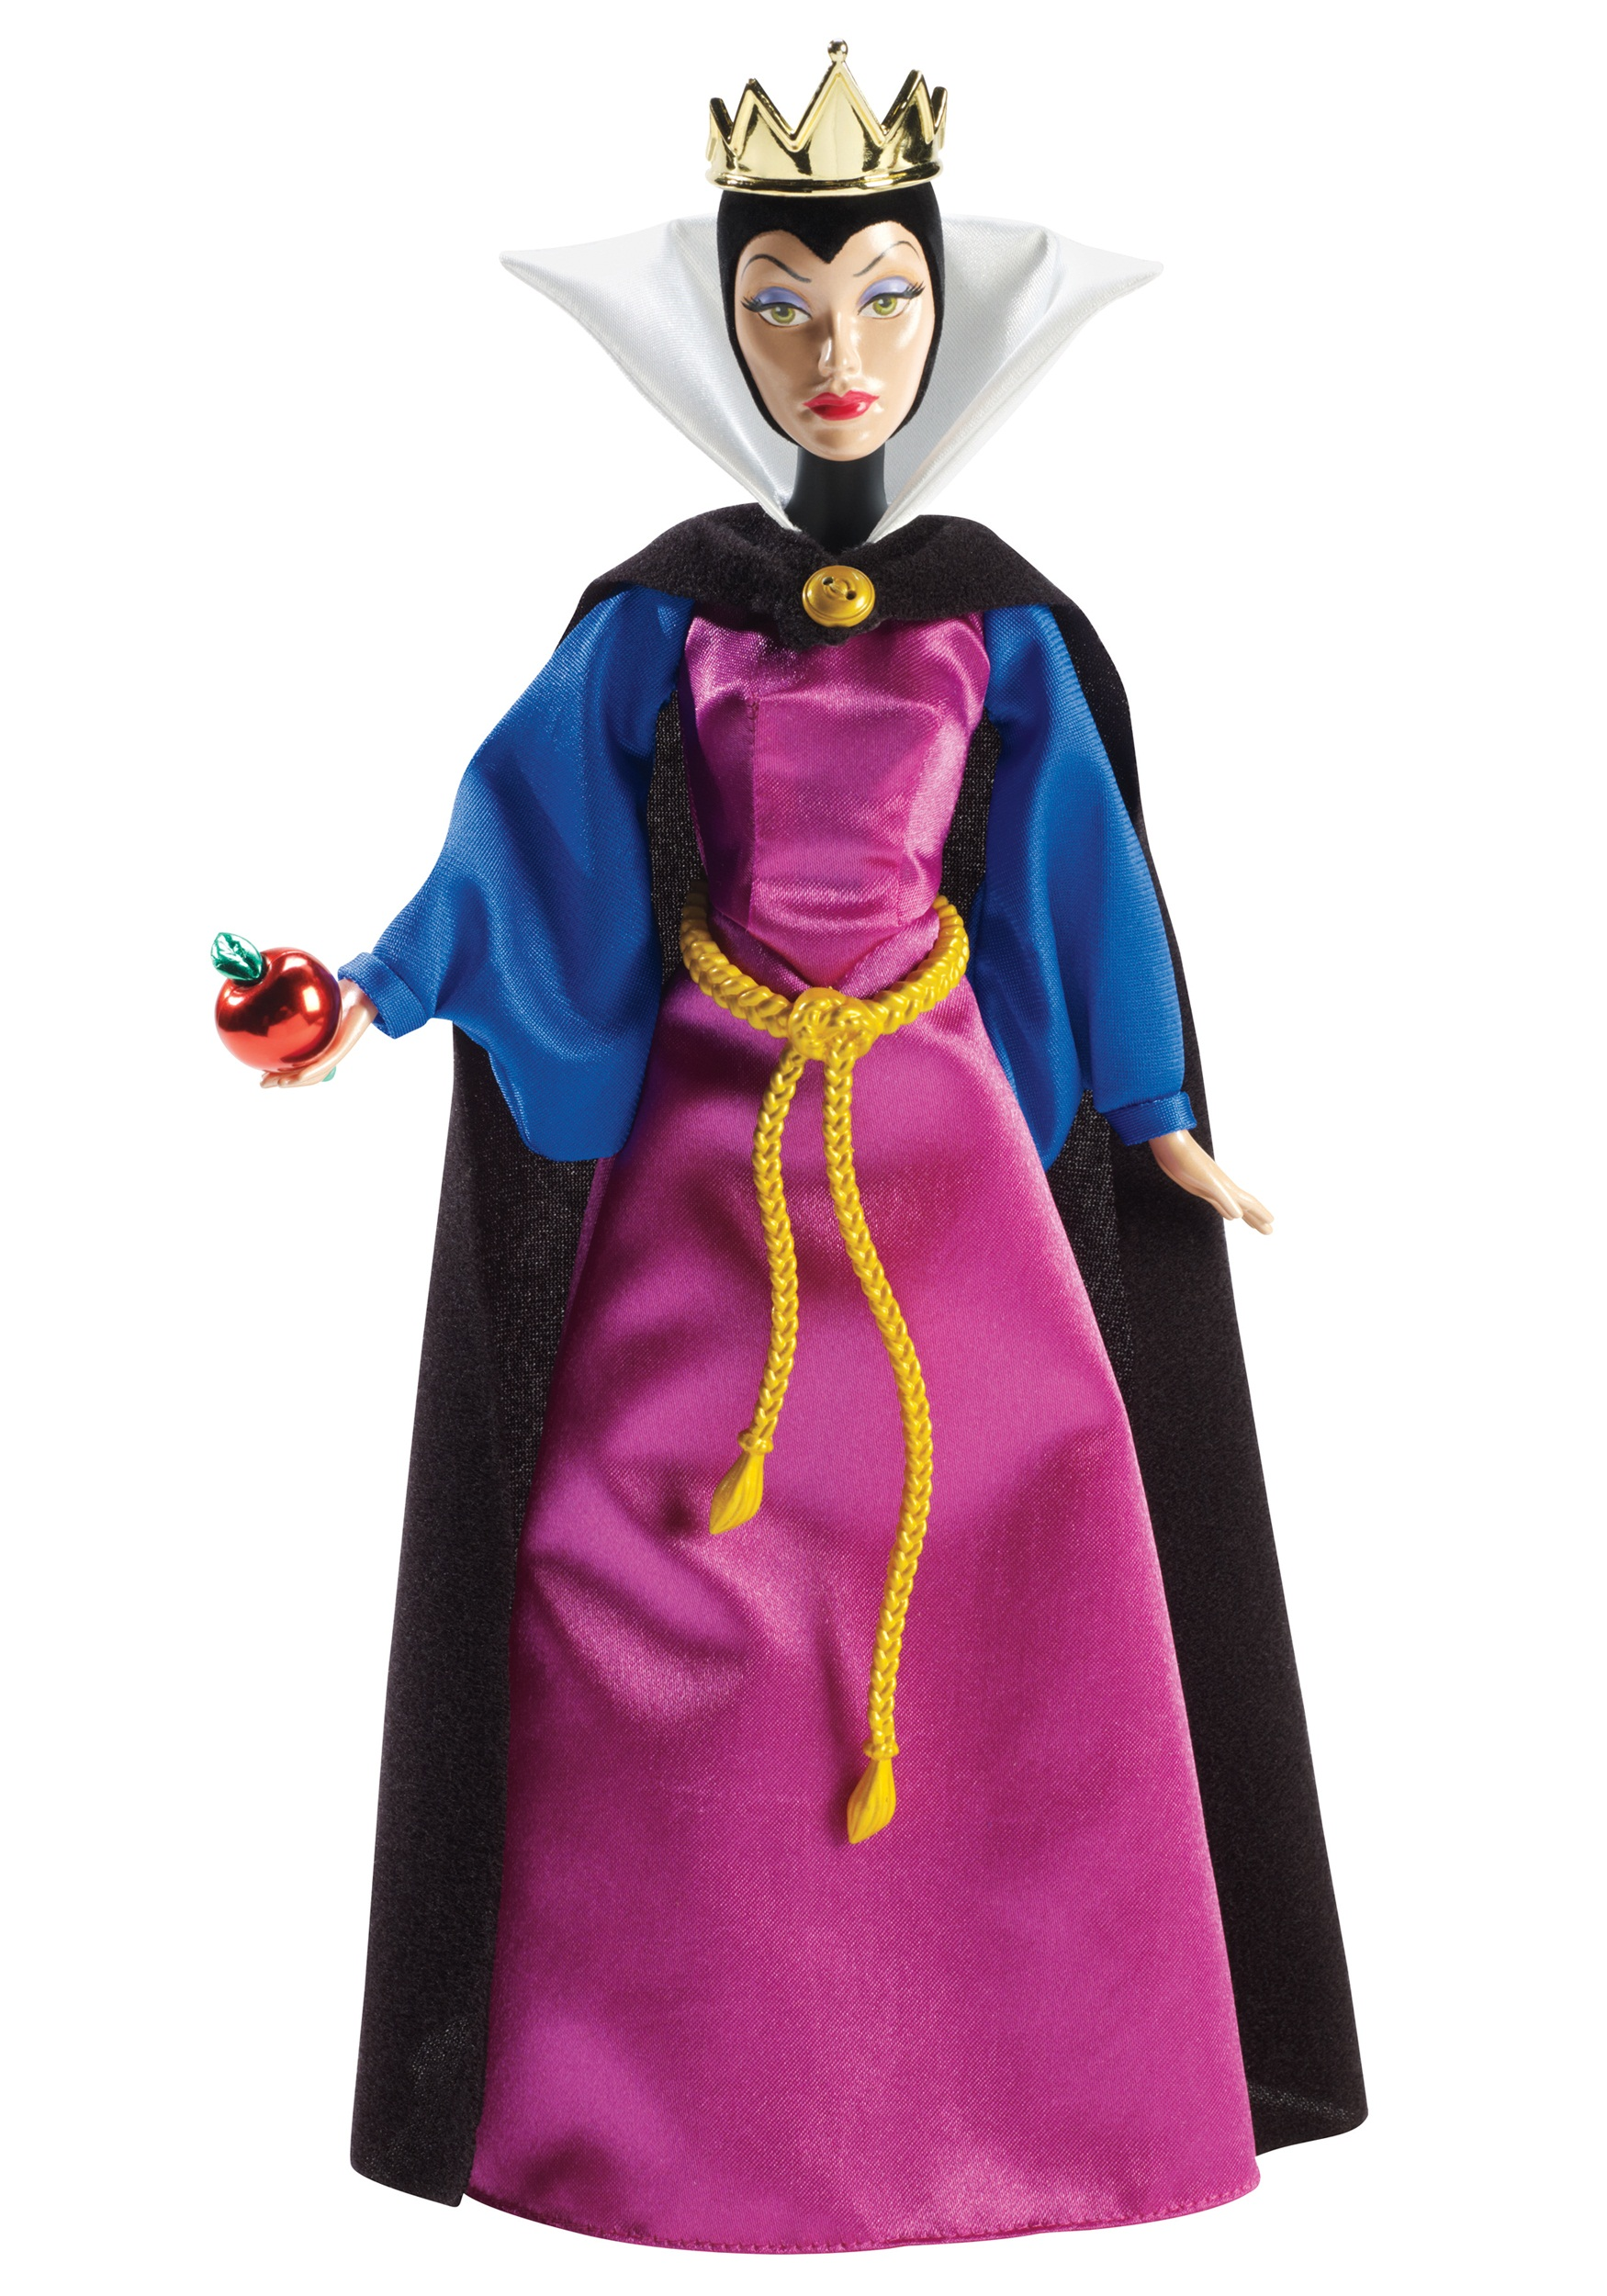 disney signature collection evil queen figure